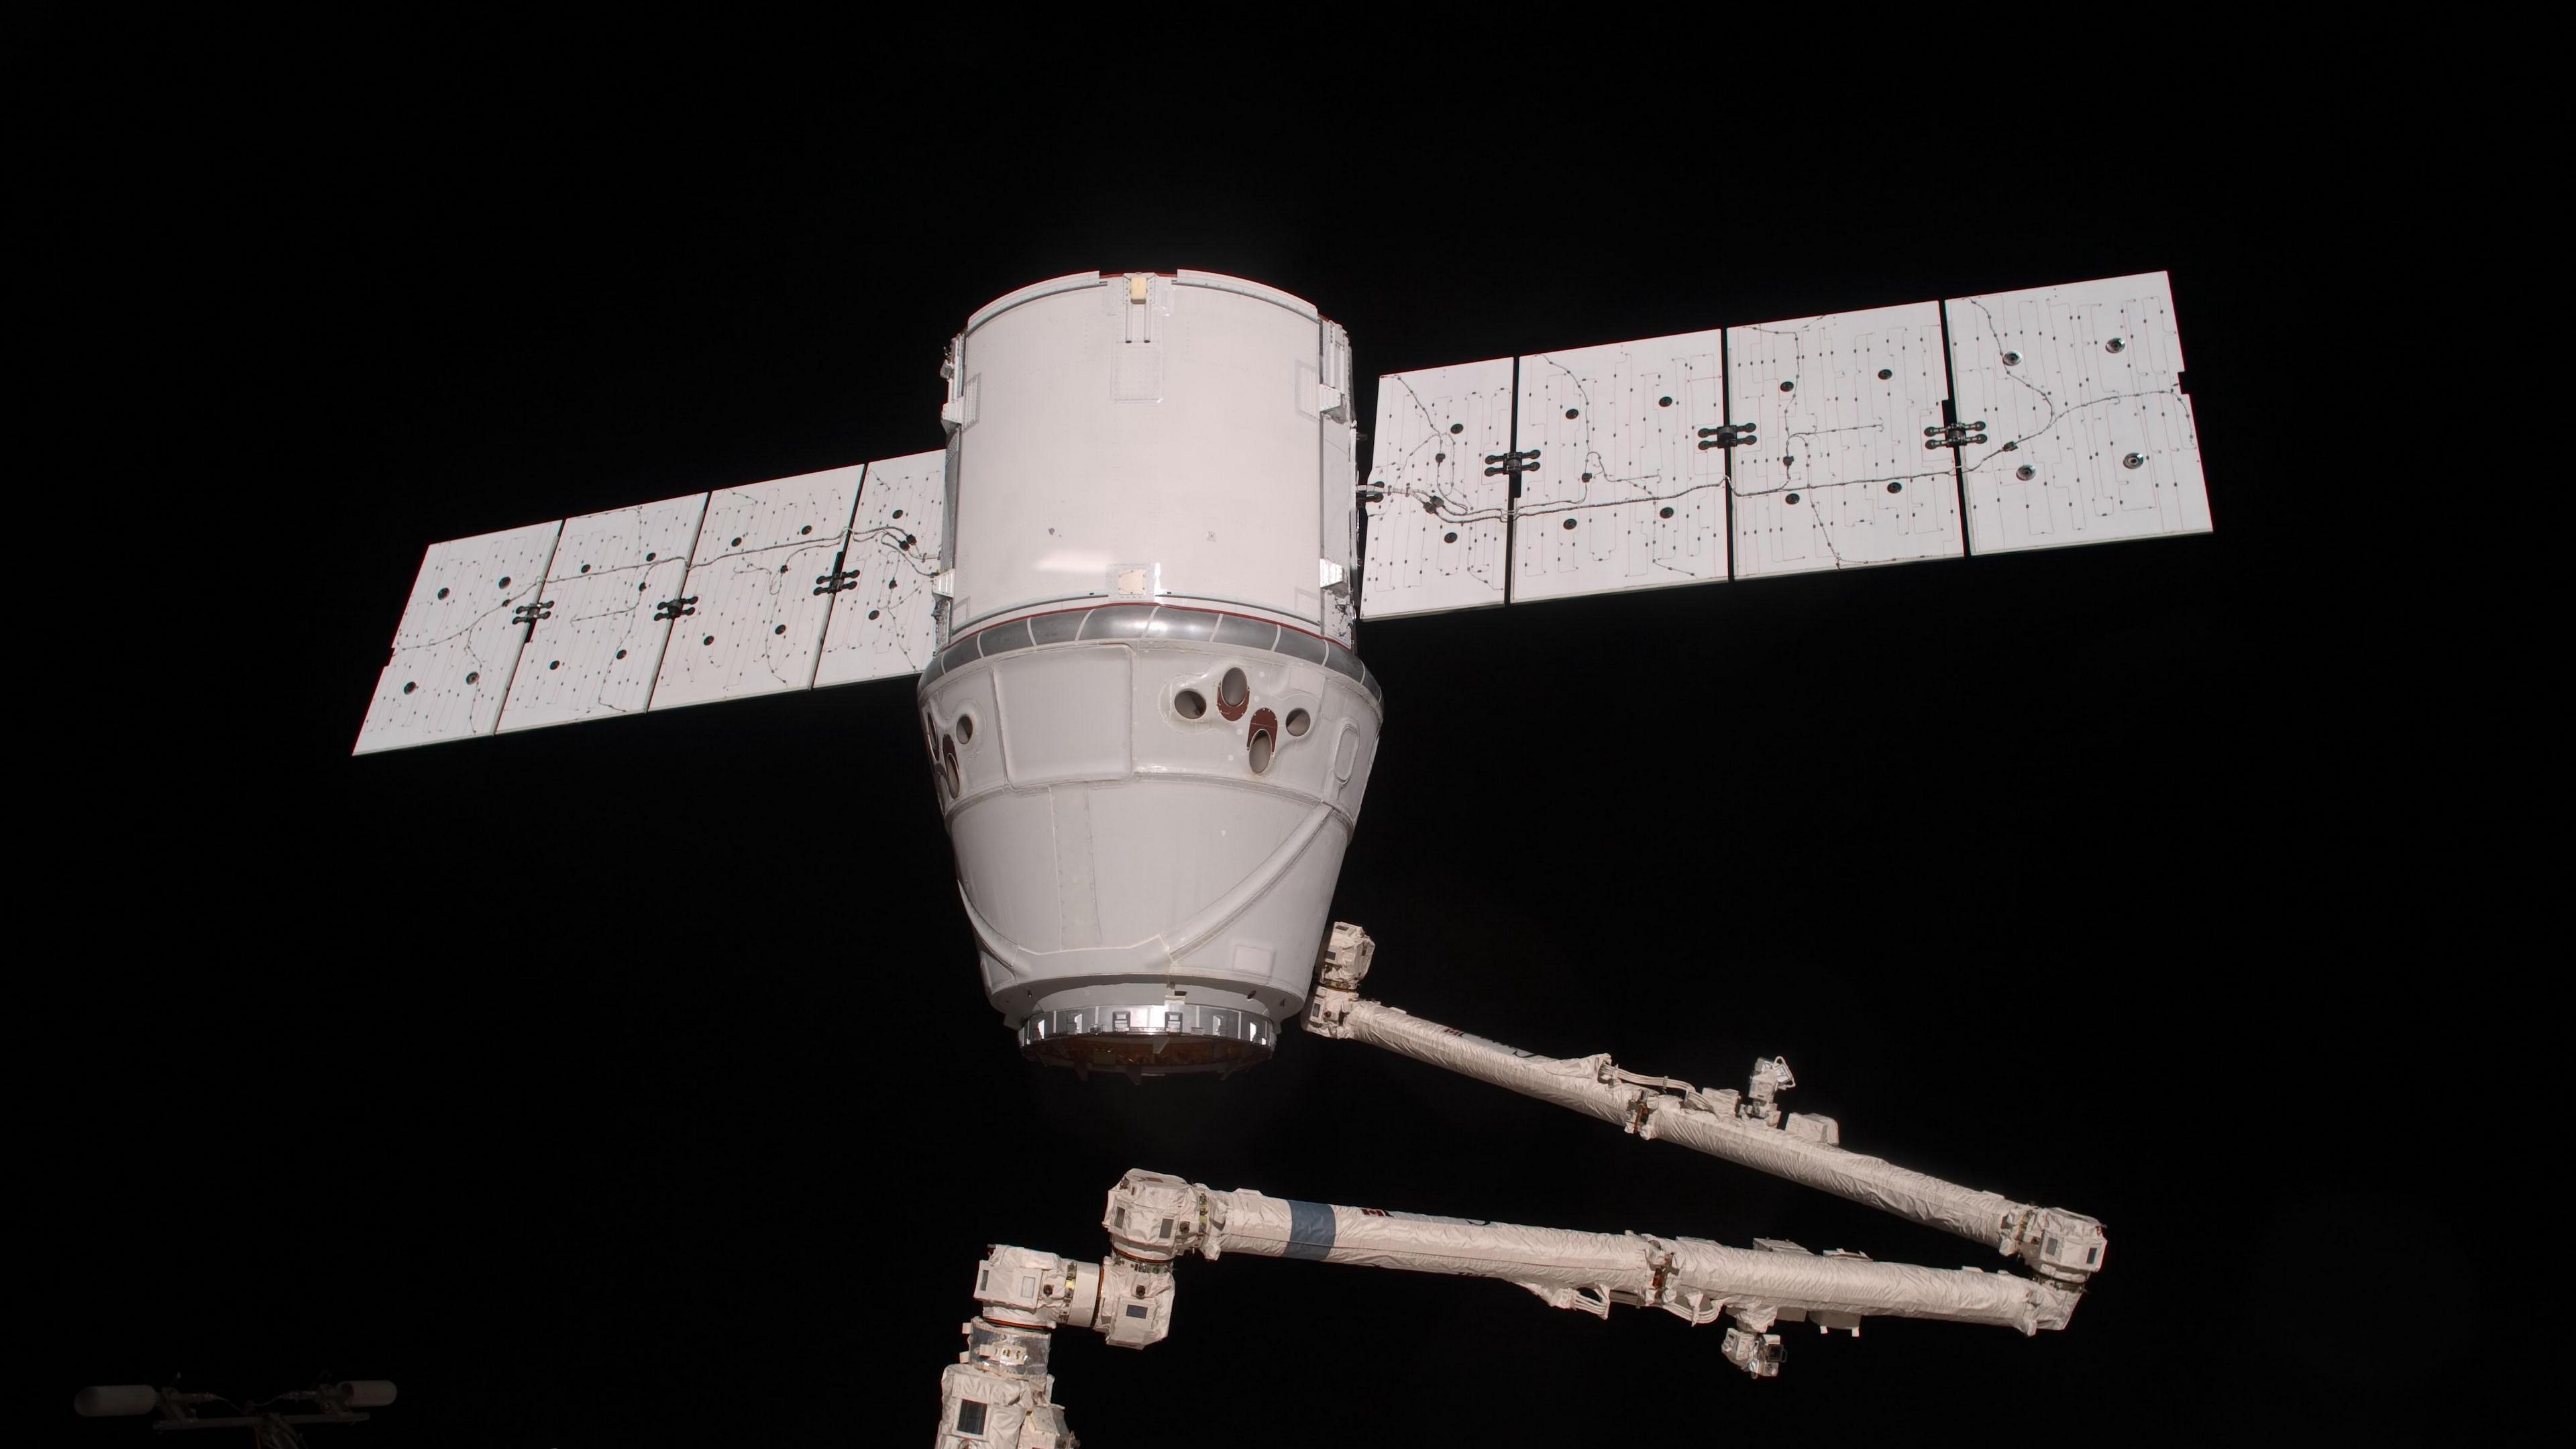 spaceship dragon iss space docking 4k 1536013724 - spaceship dragon, iss, space, docking 4k - spaceship dragon, Space, iss